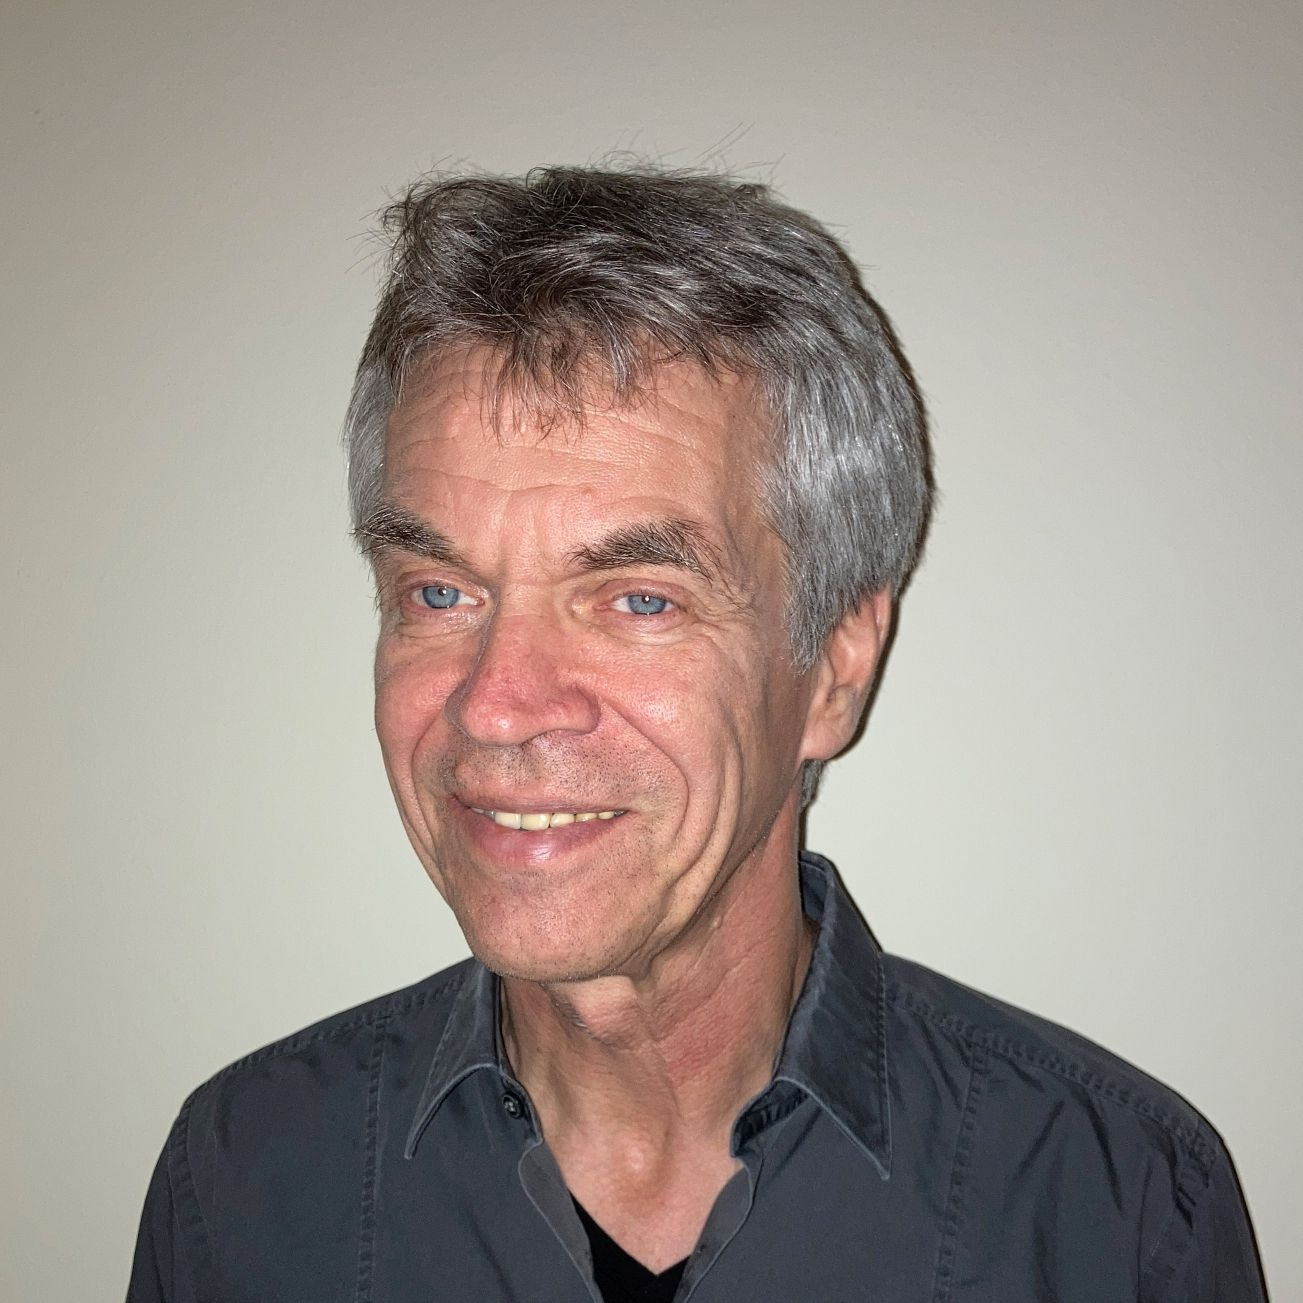 Ulrich Roling